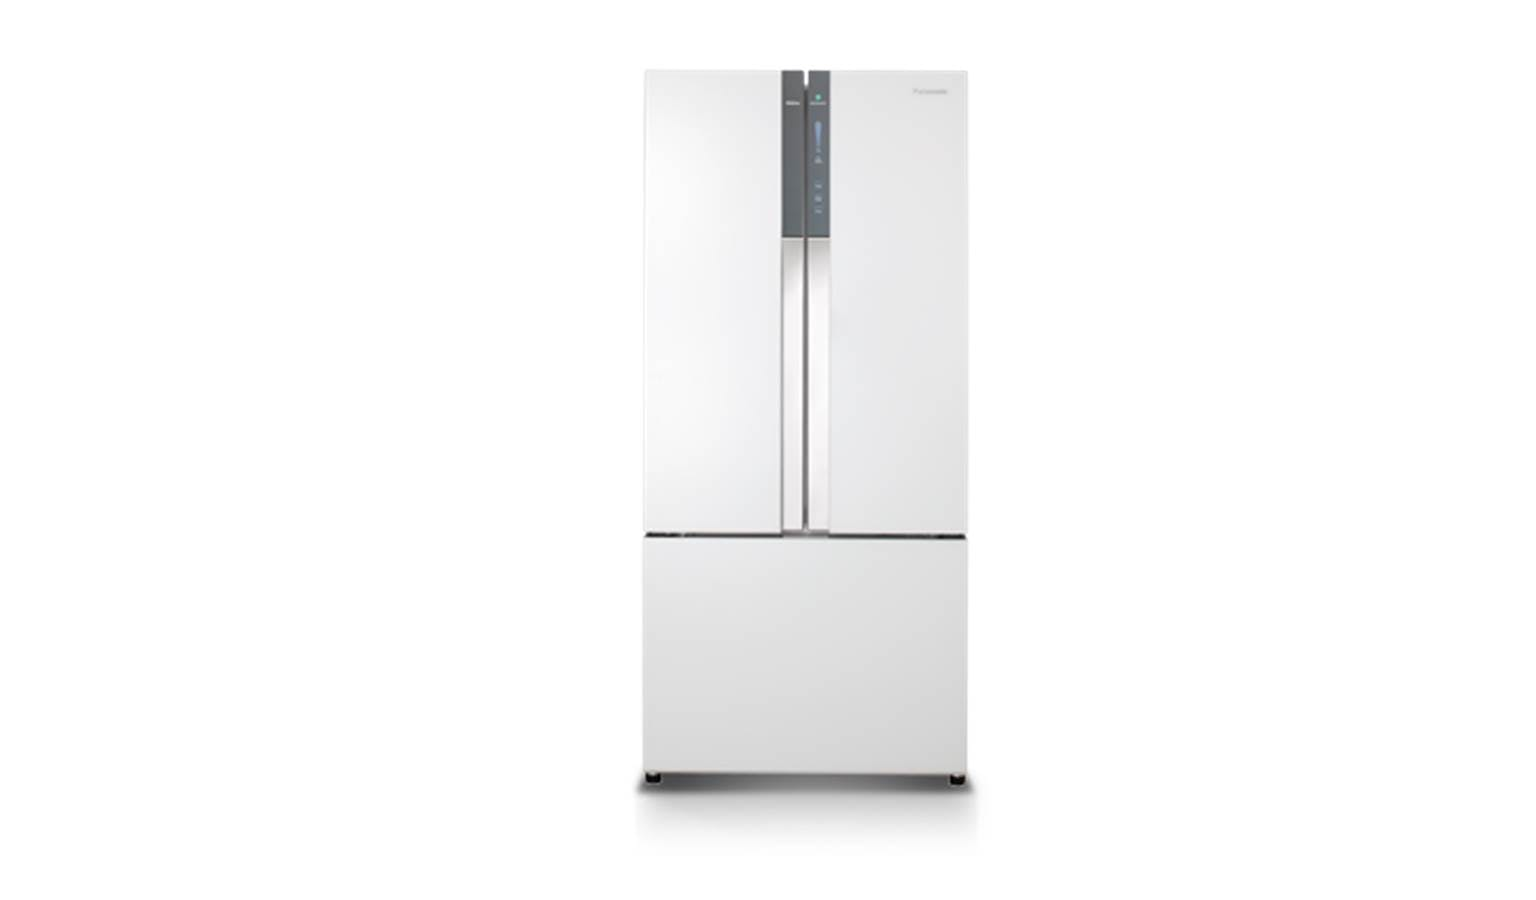 Panasonic Nr Cy558gwsg French Door Design Refrigerator White